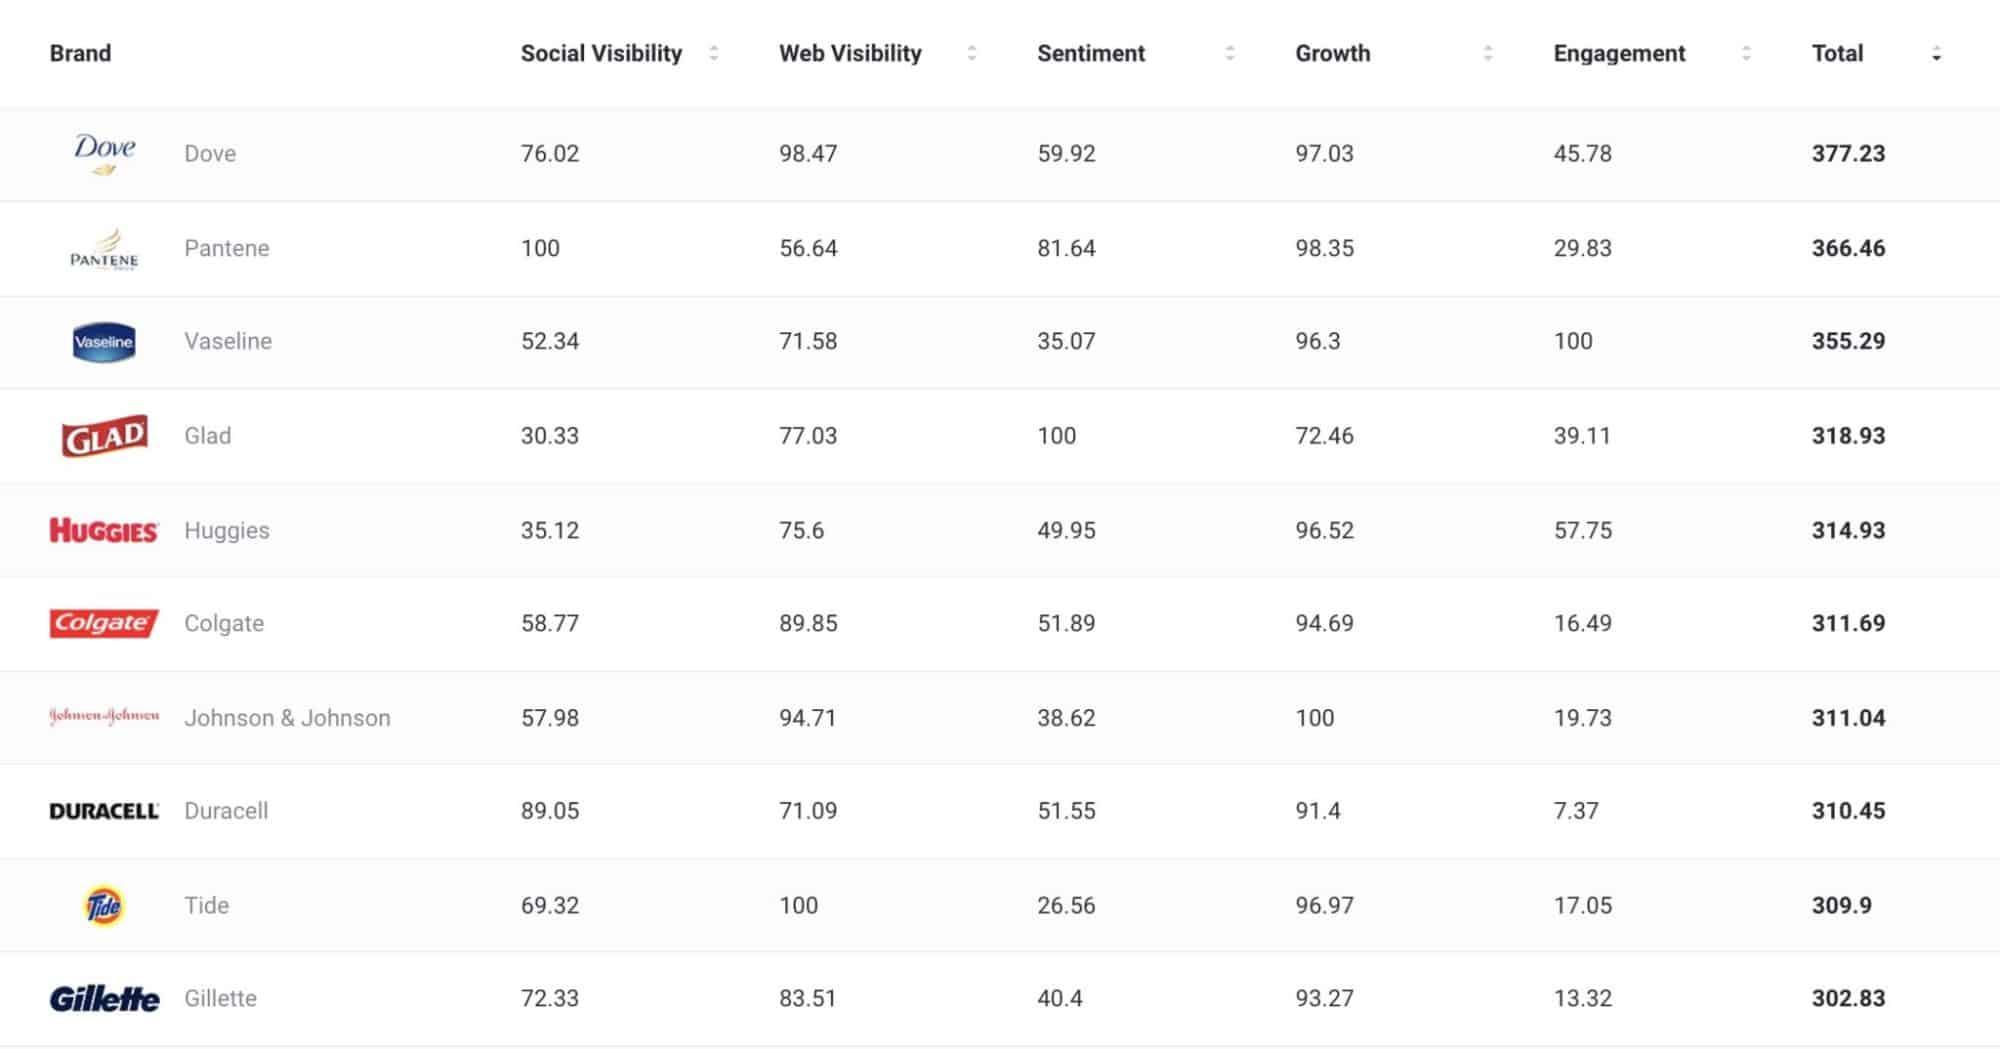 Social Brand Index - Non-perishables